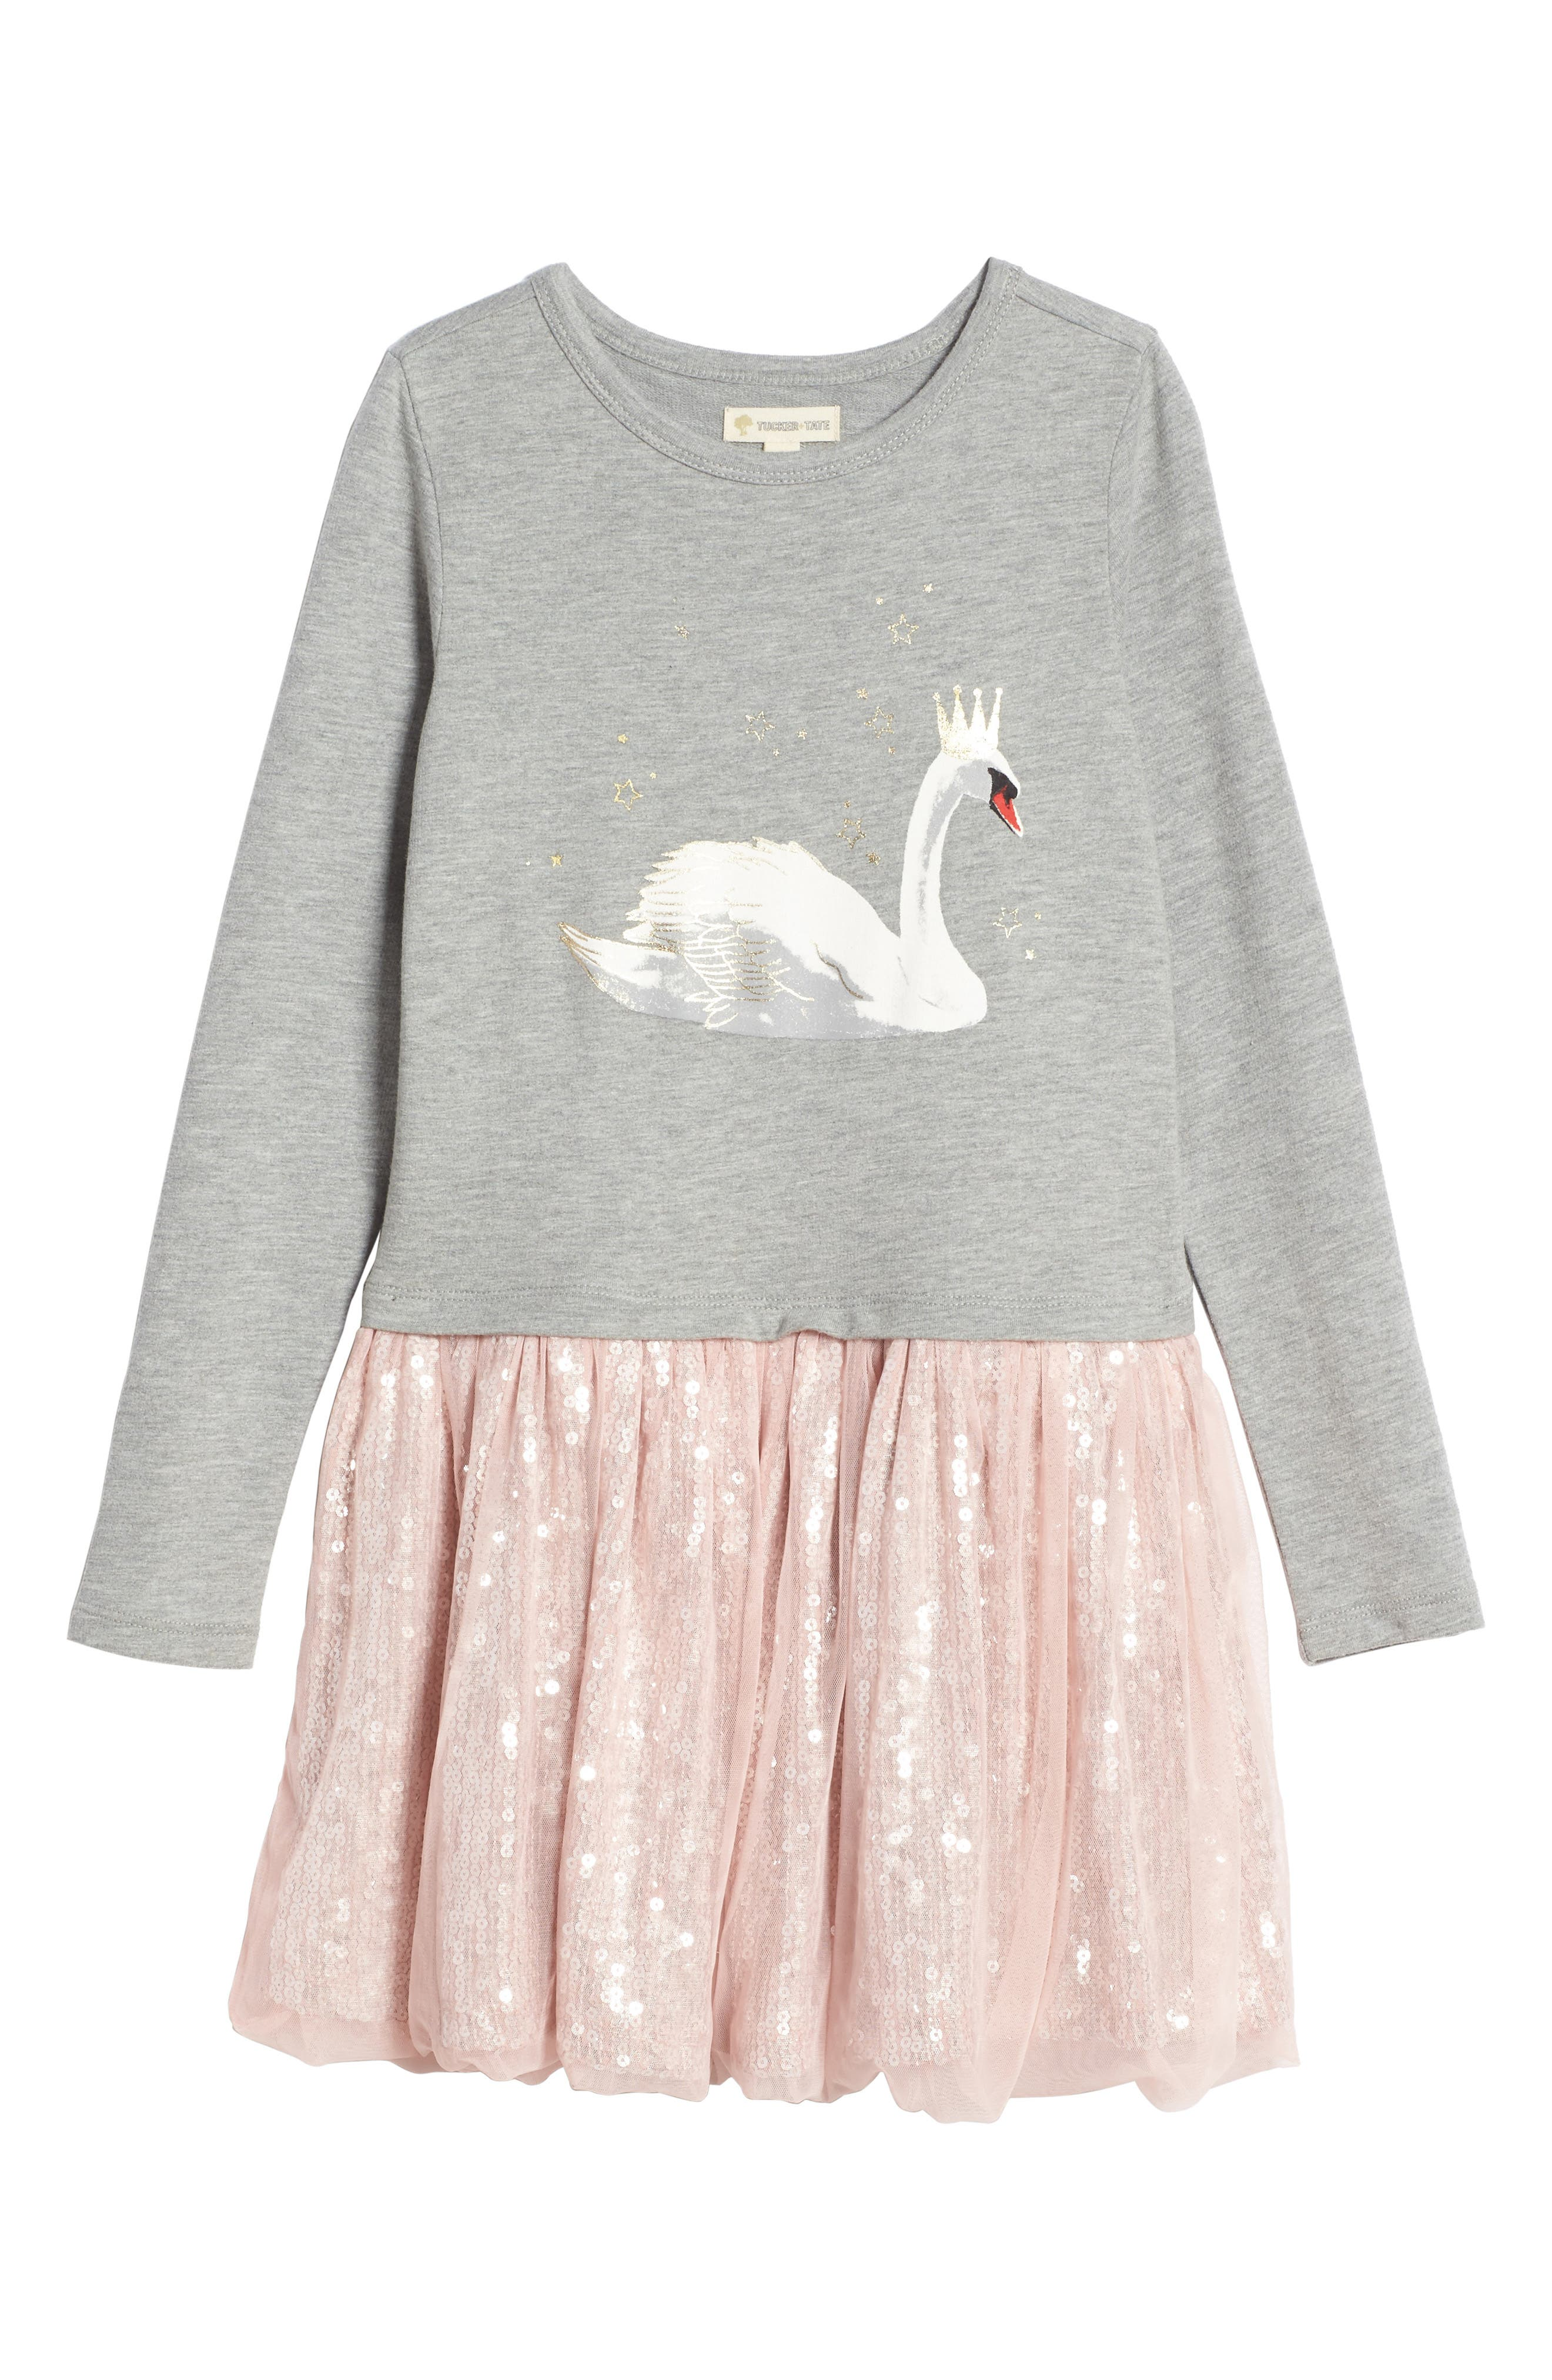 Sequin Tutu Dress,                             Main thumbnail 1, color,                             Grey Medium Heather Swan